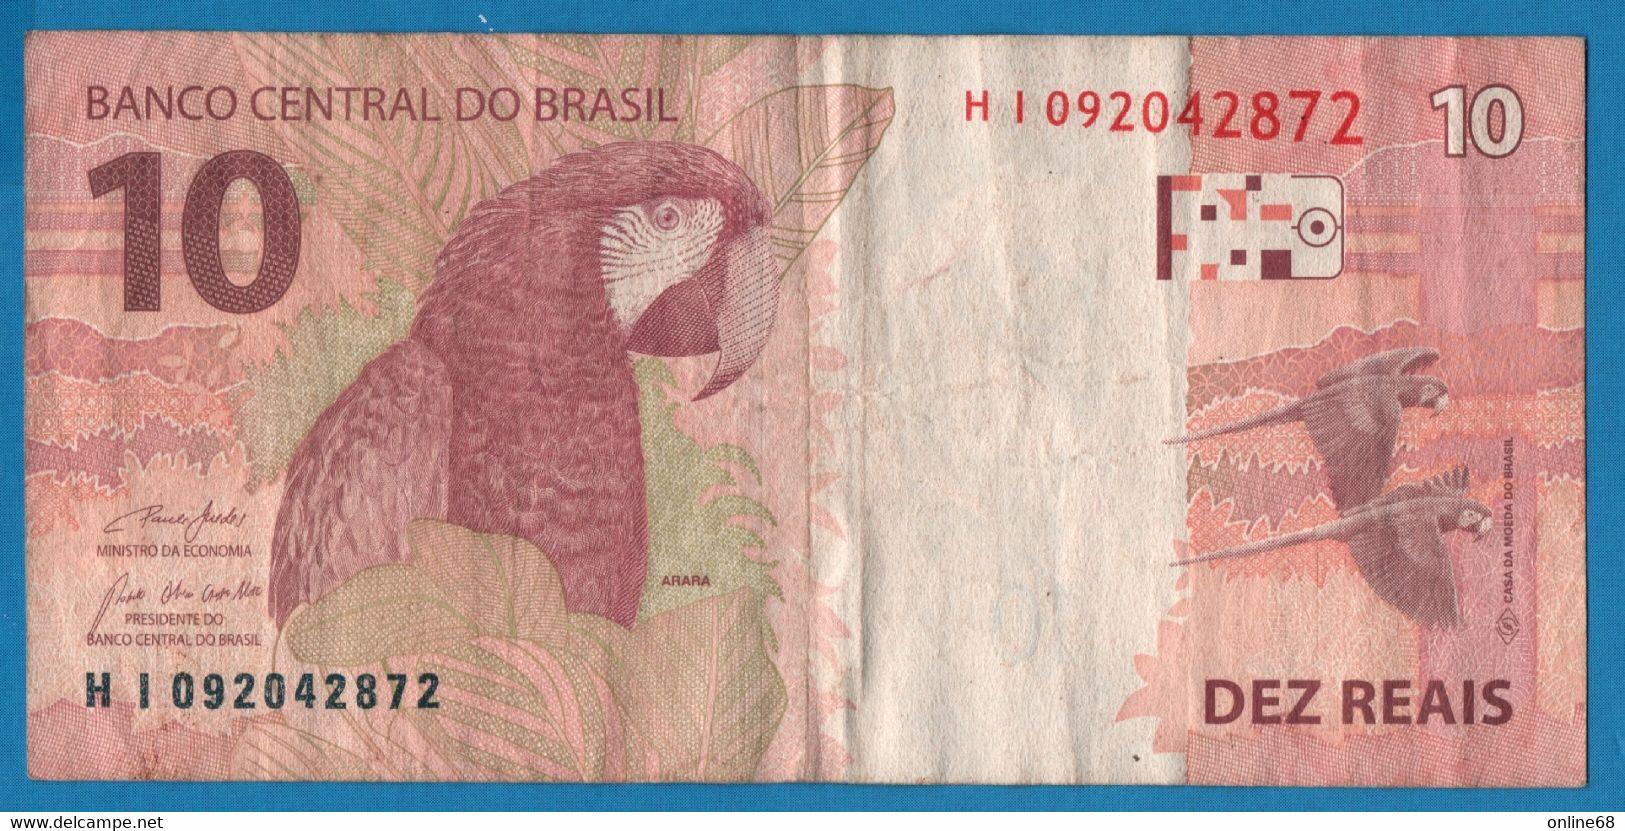 BRASIL 10 REALS 2010 # HI092042872 P# 254e   Arara - Brazil